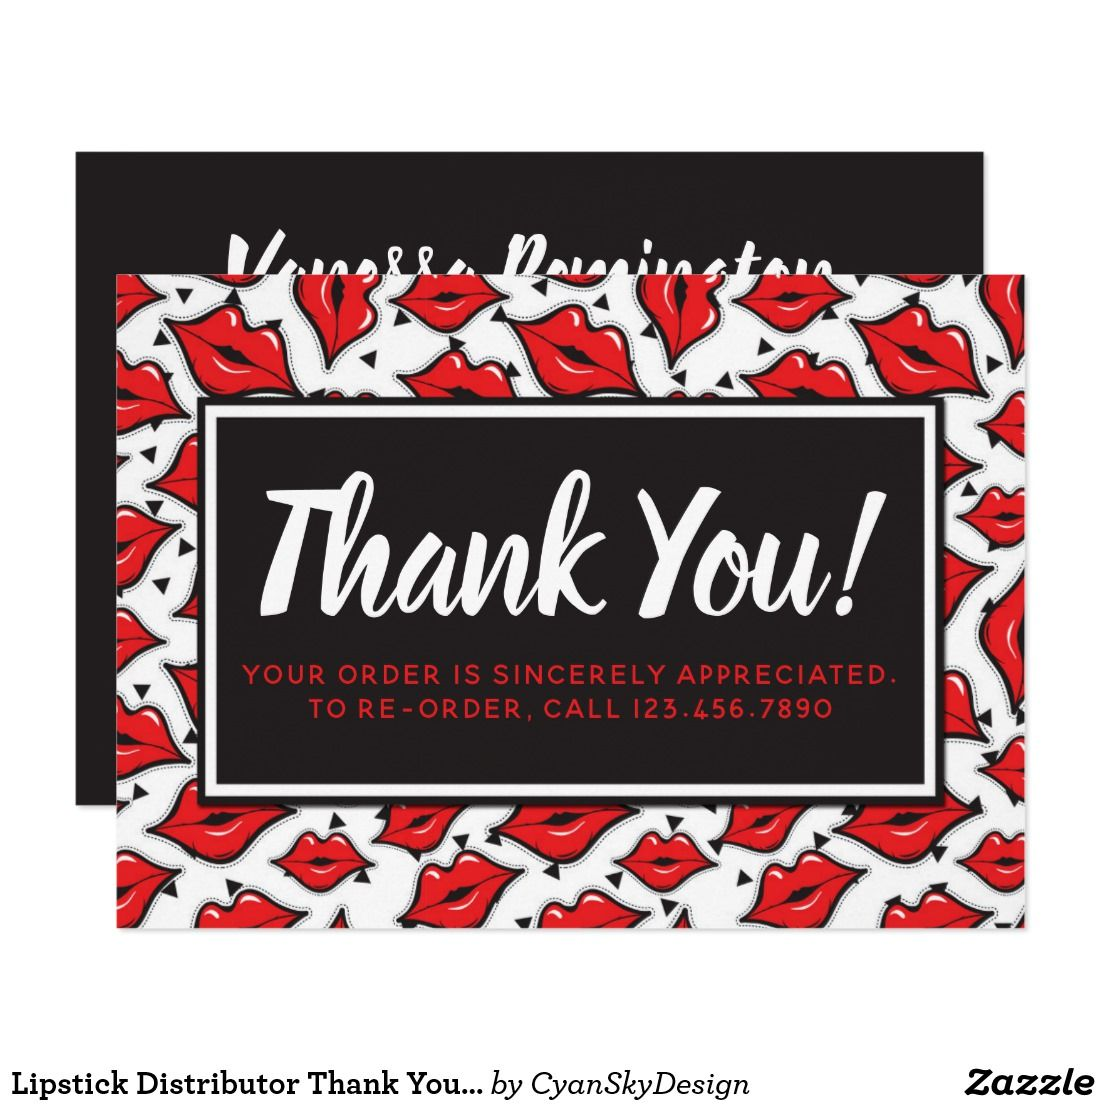 Lipstick Distributor Thank You Red Lips Kiss Card Lipsense